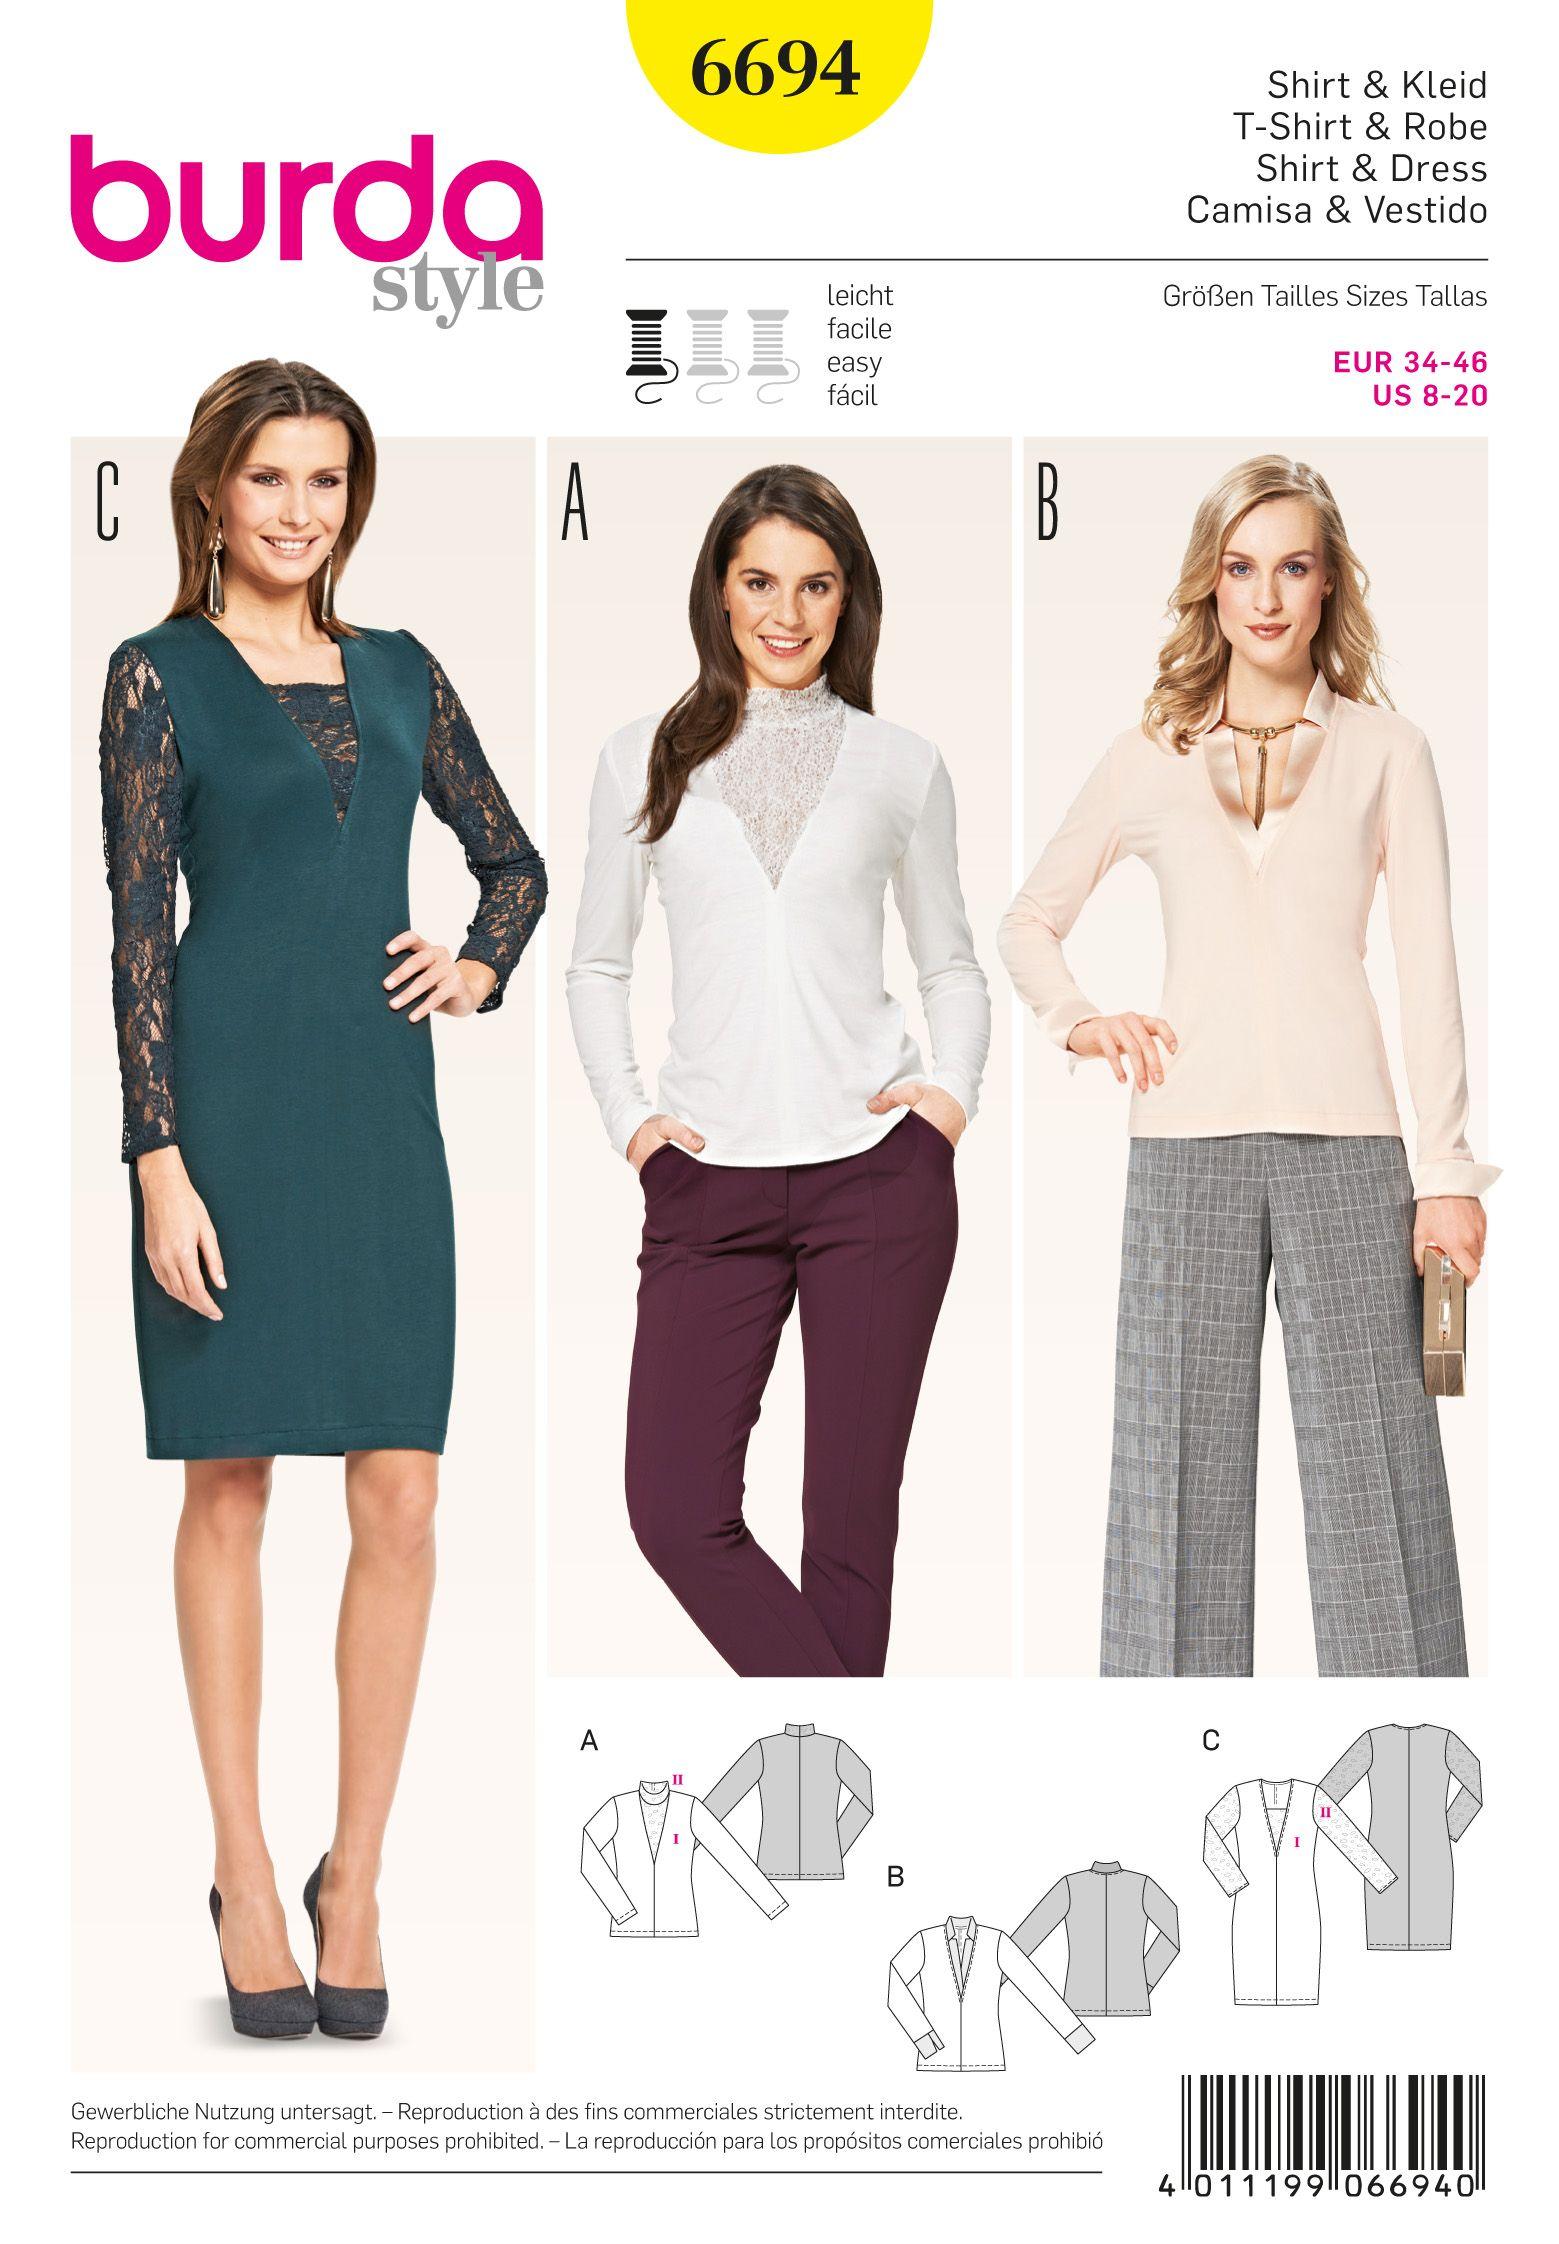 burda style 6694 - Google Search | DIY, Sewing, Knitting and ...